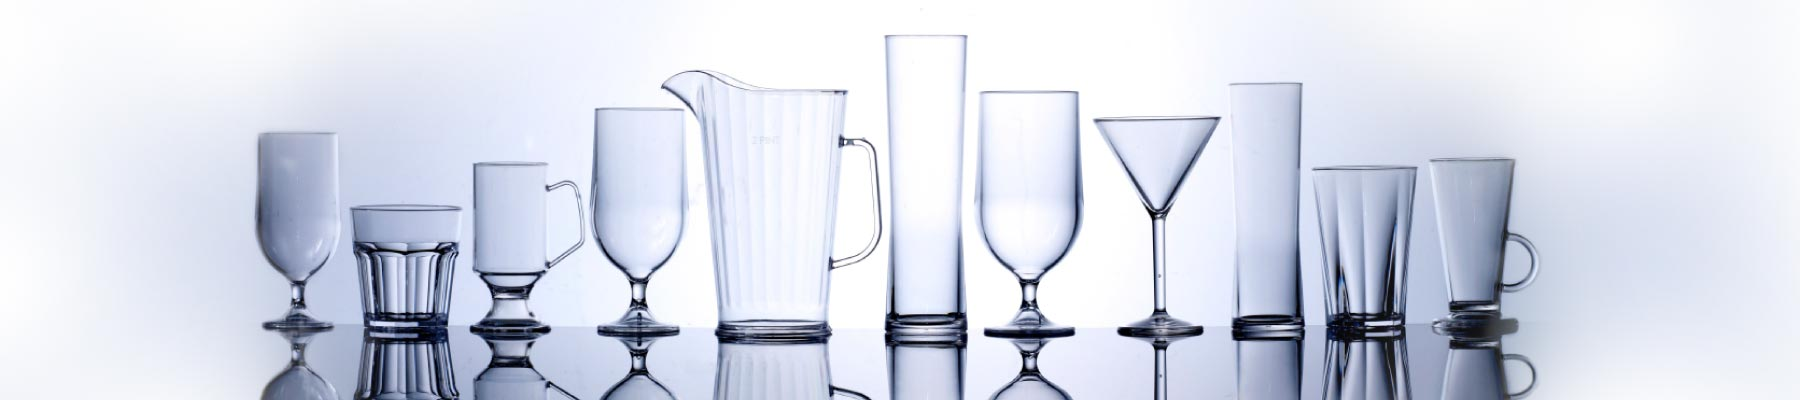 Large plastic glassware suppliers in Hampshire